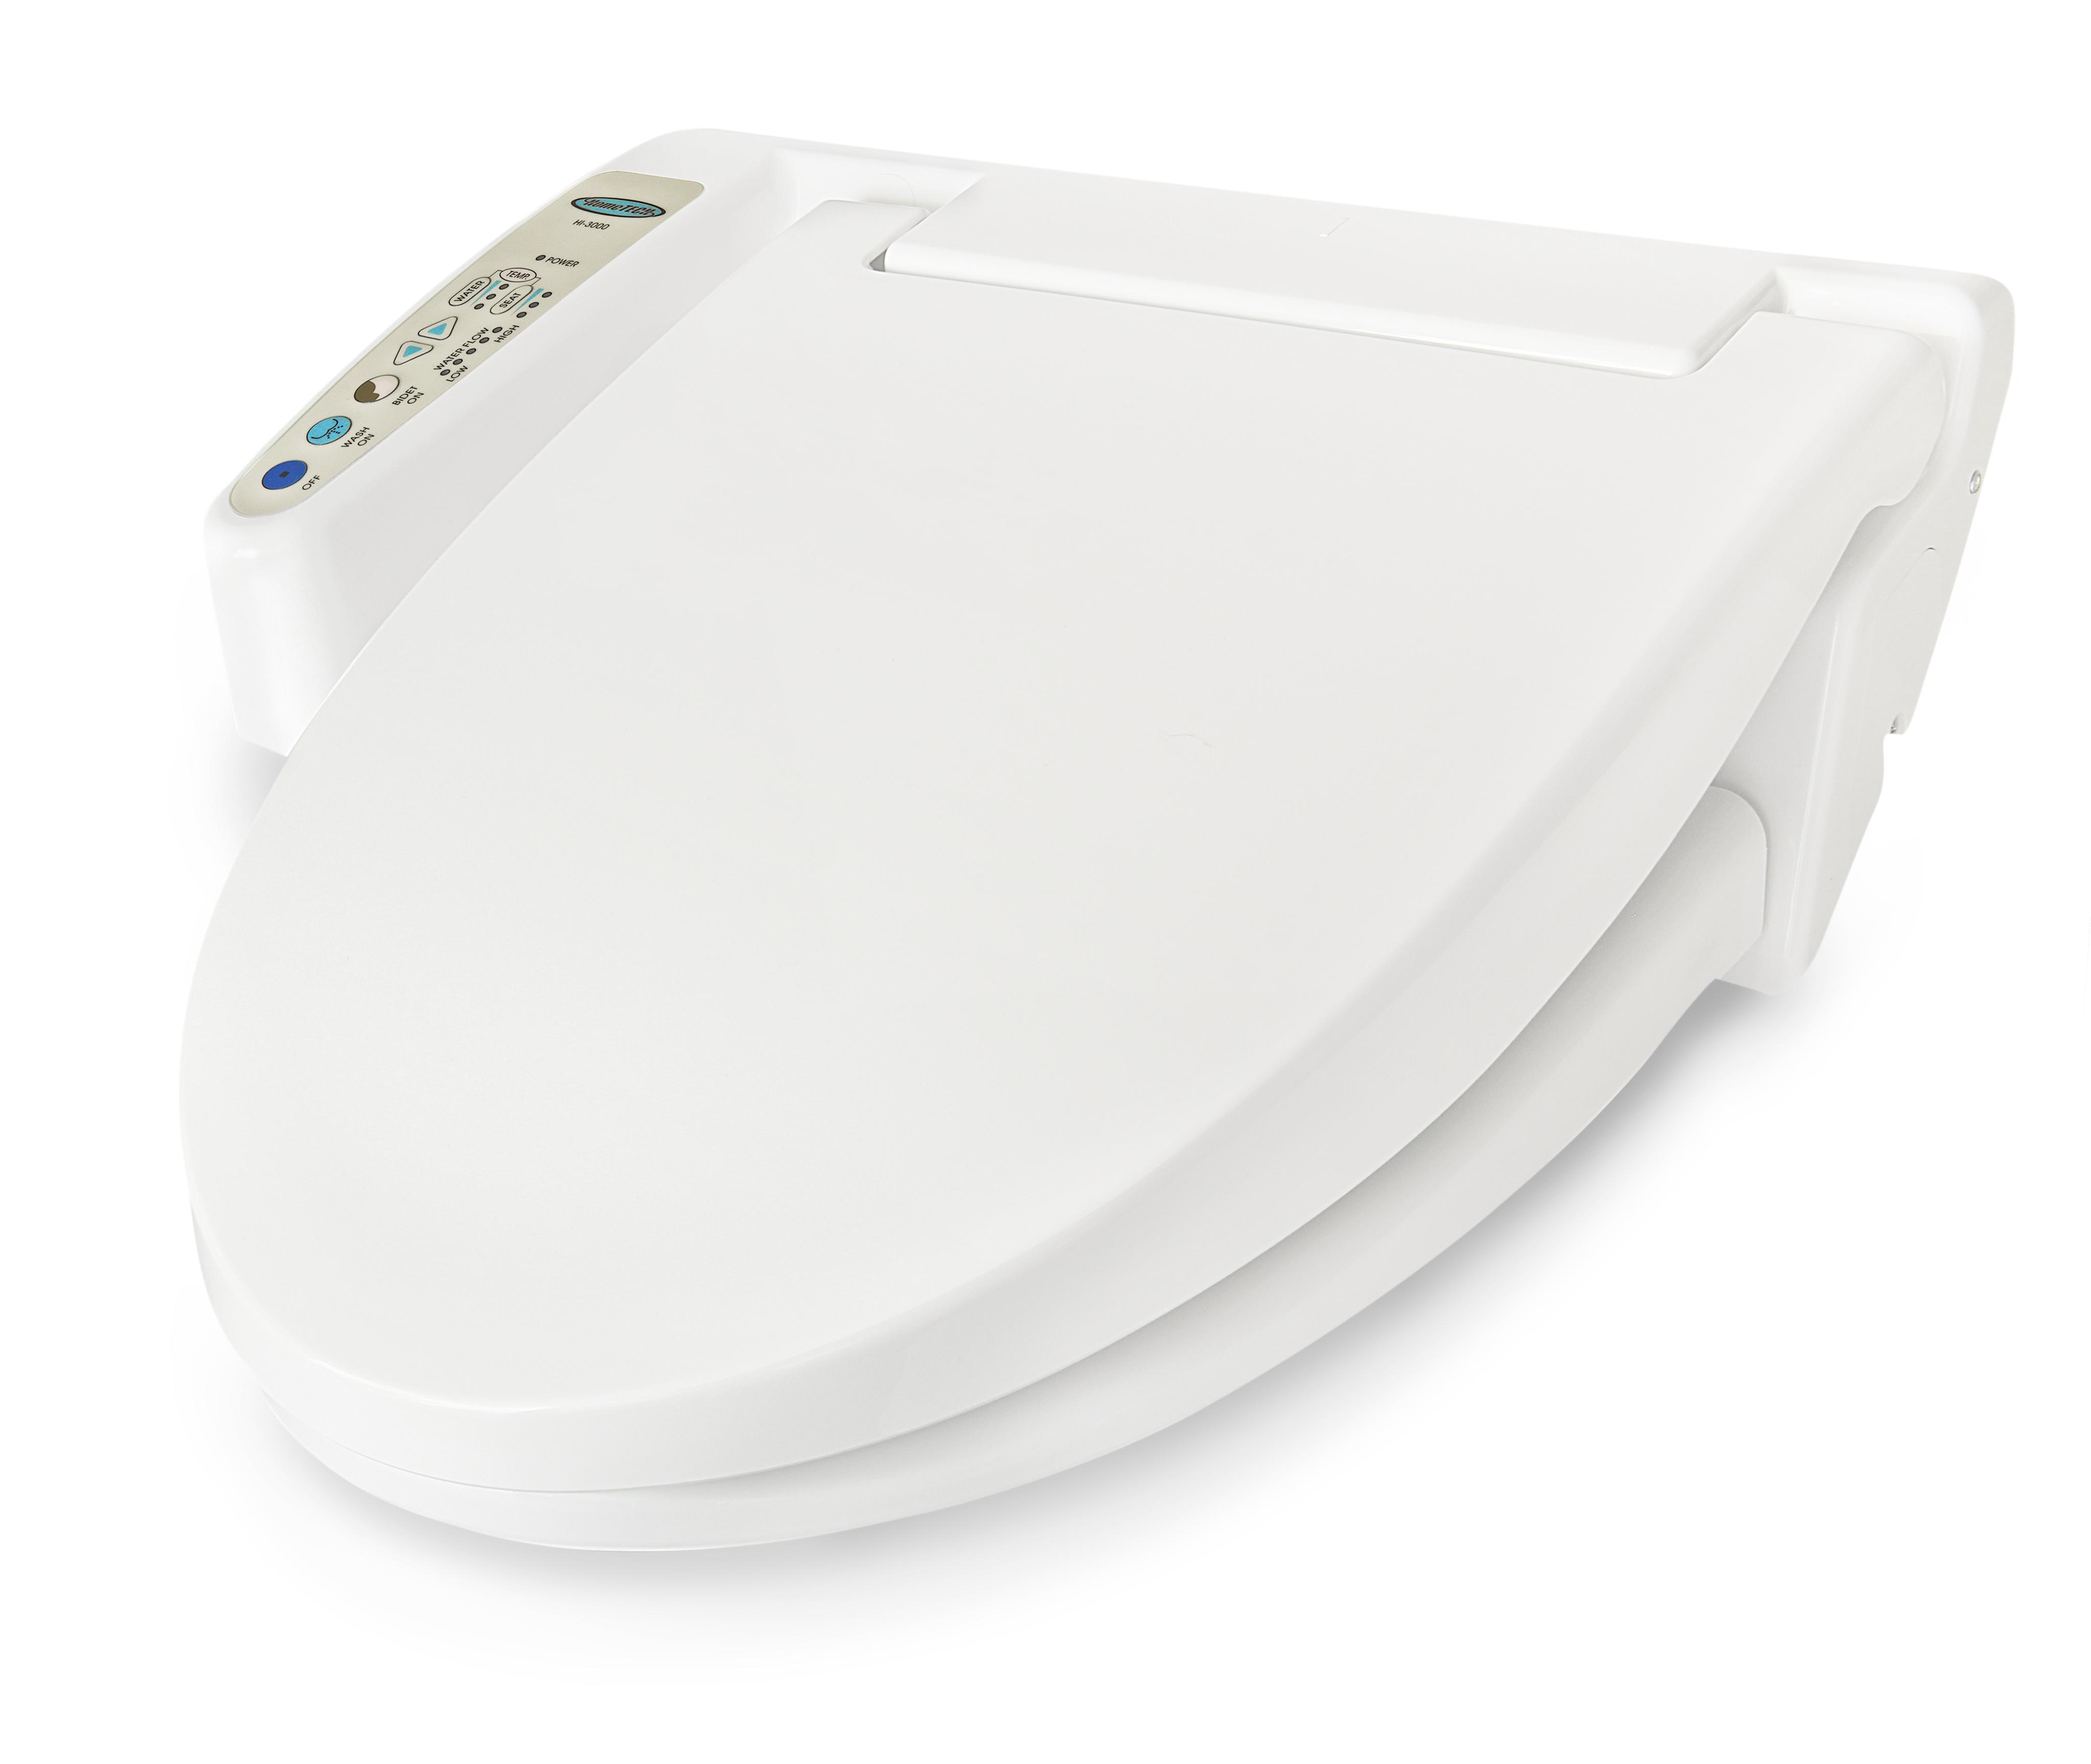 On Sale Hometech Hi 3000 Bidet Toilet Seat Bidet Toilet Seat Com